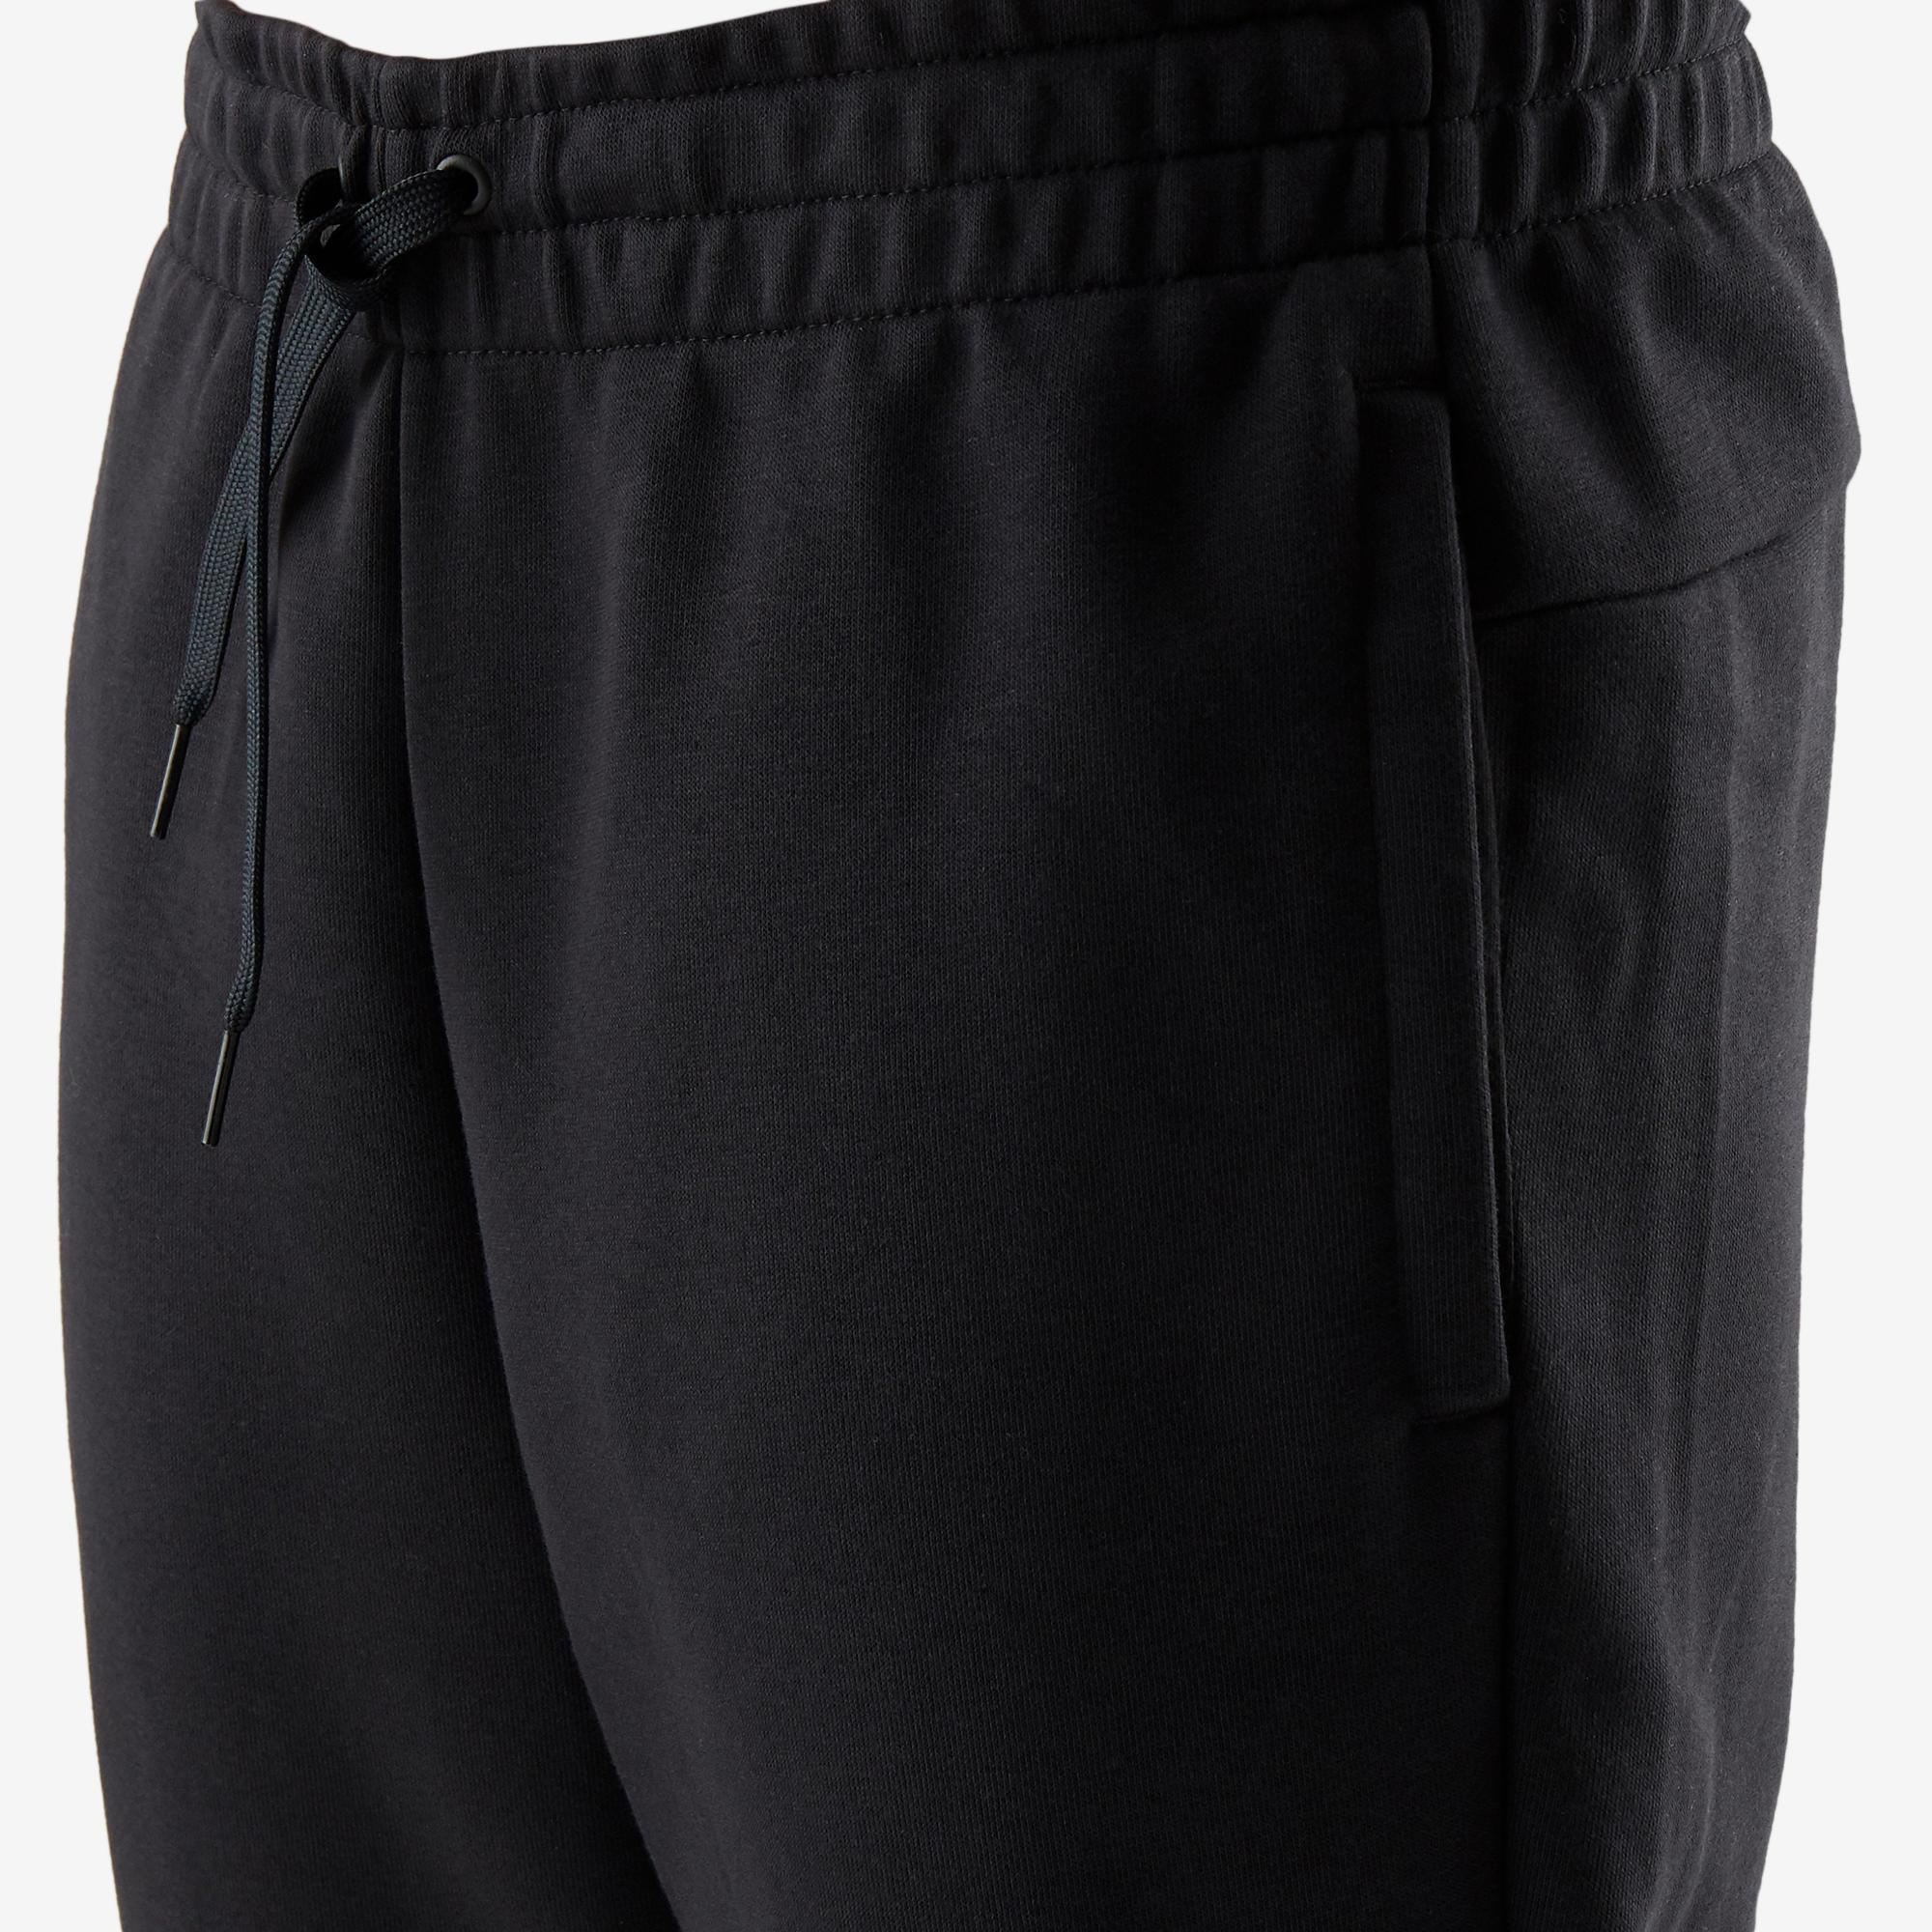 cheap for discount 92d87 76a28 500 Linear Pilates Pantalon Adidas Noirblanc Douce Gym Femme